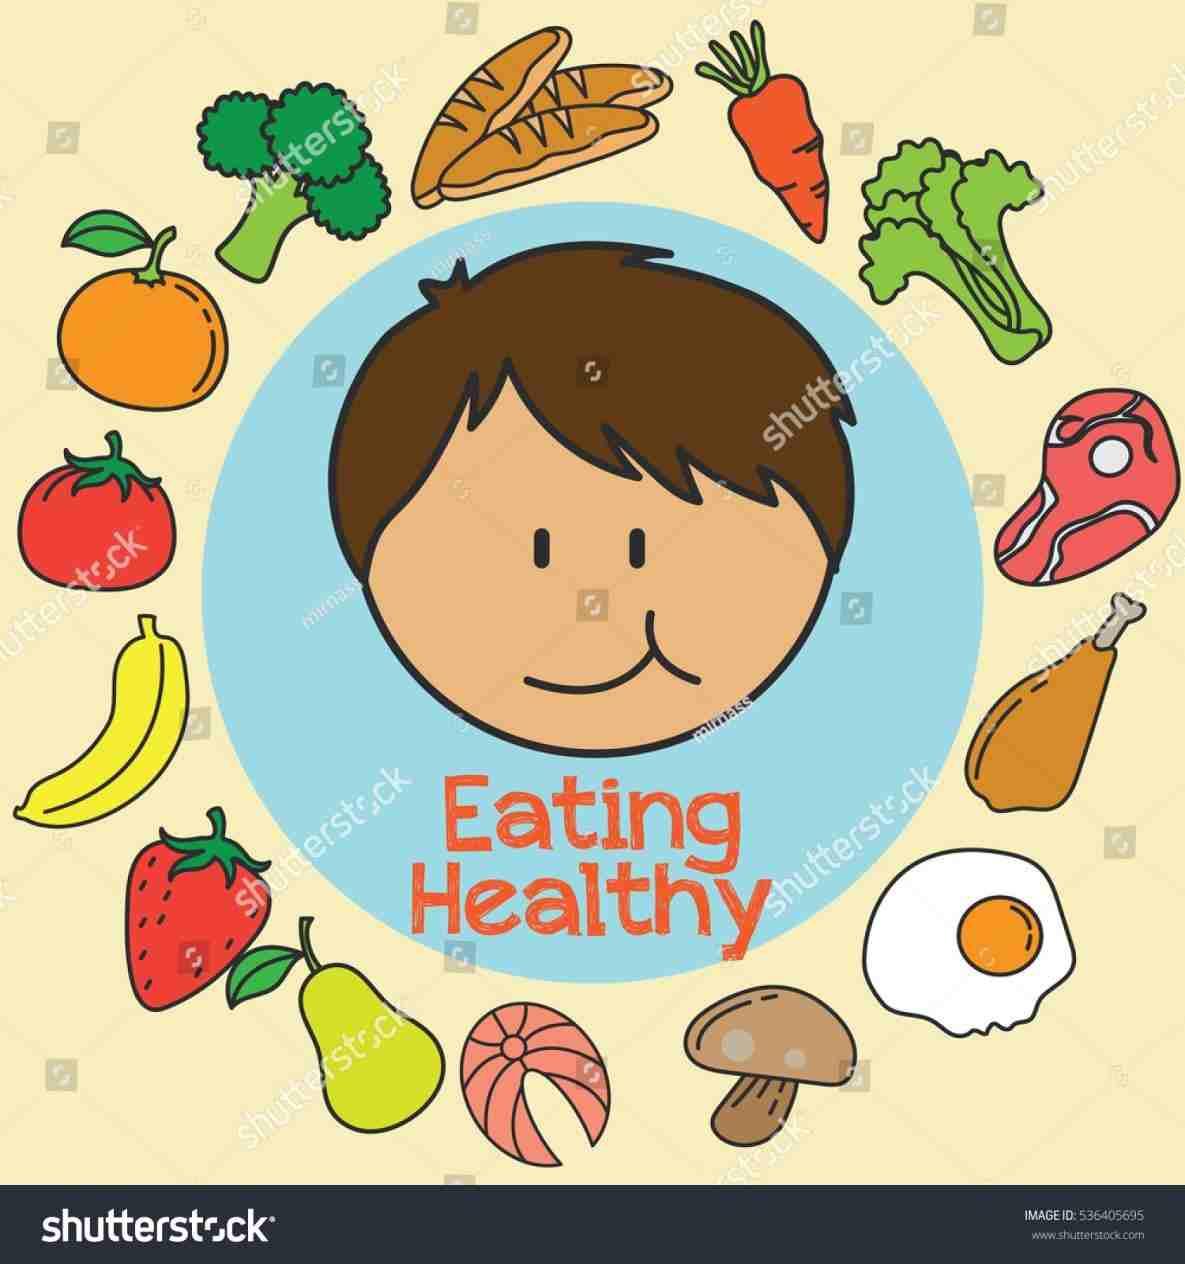 Children rhyoutubecom nutrition Kids Eating Healthy Foods Clipart.